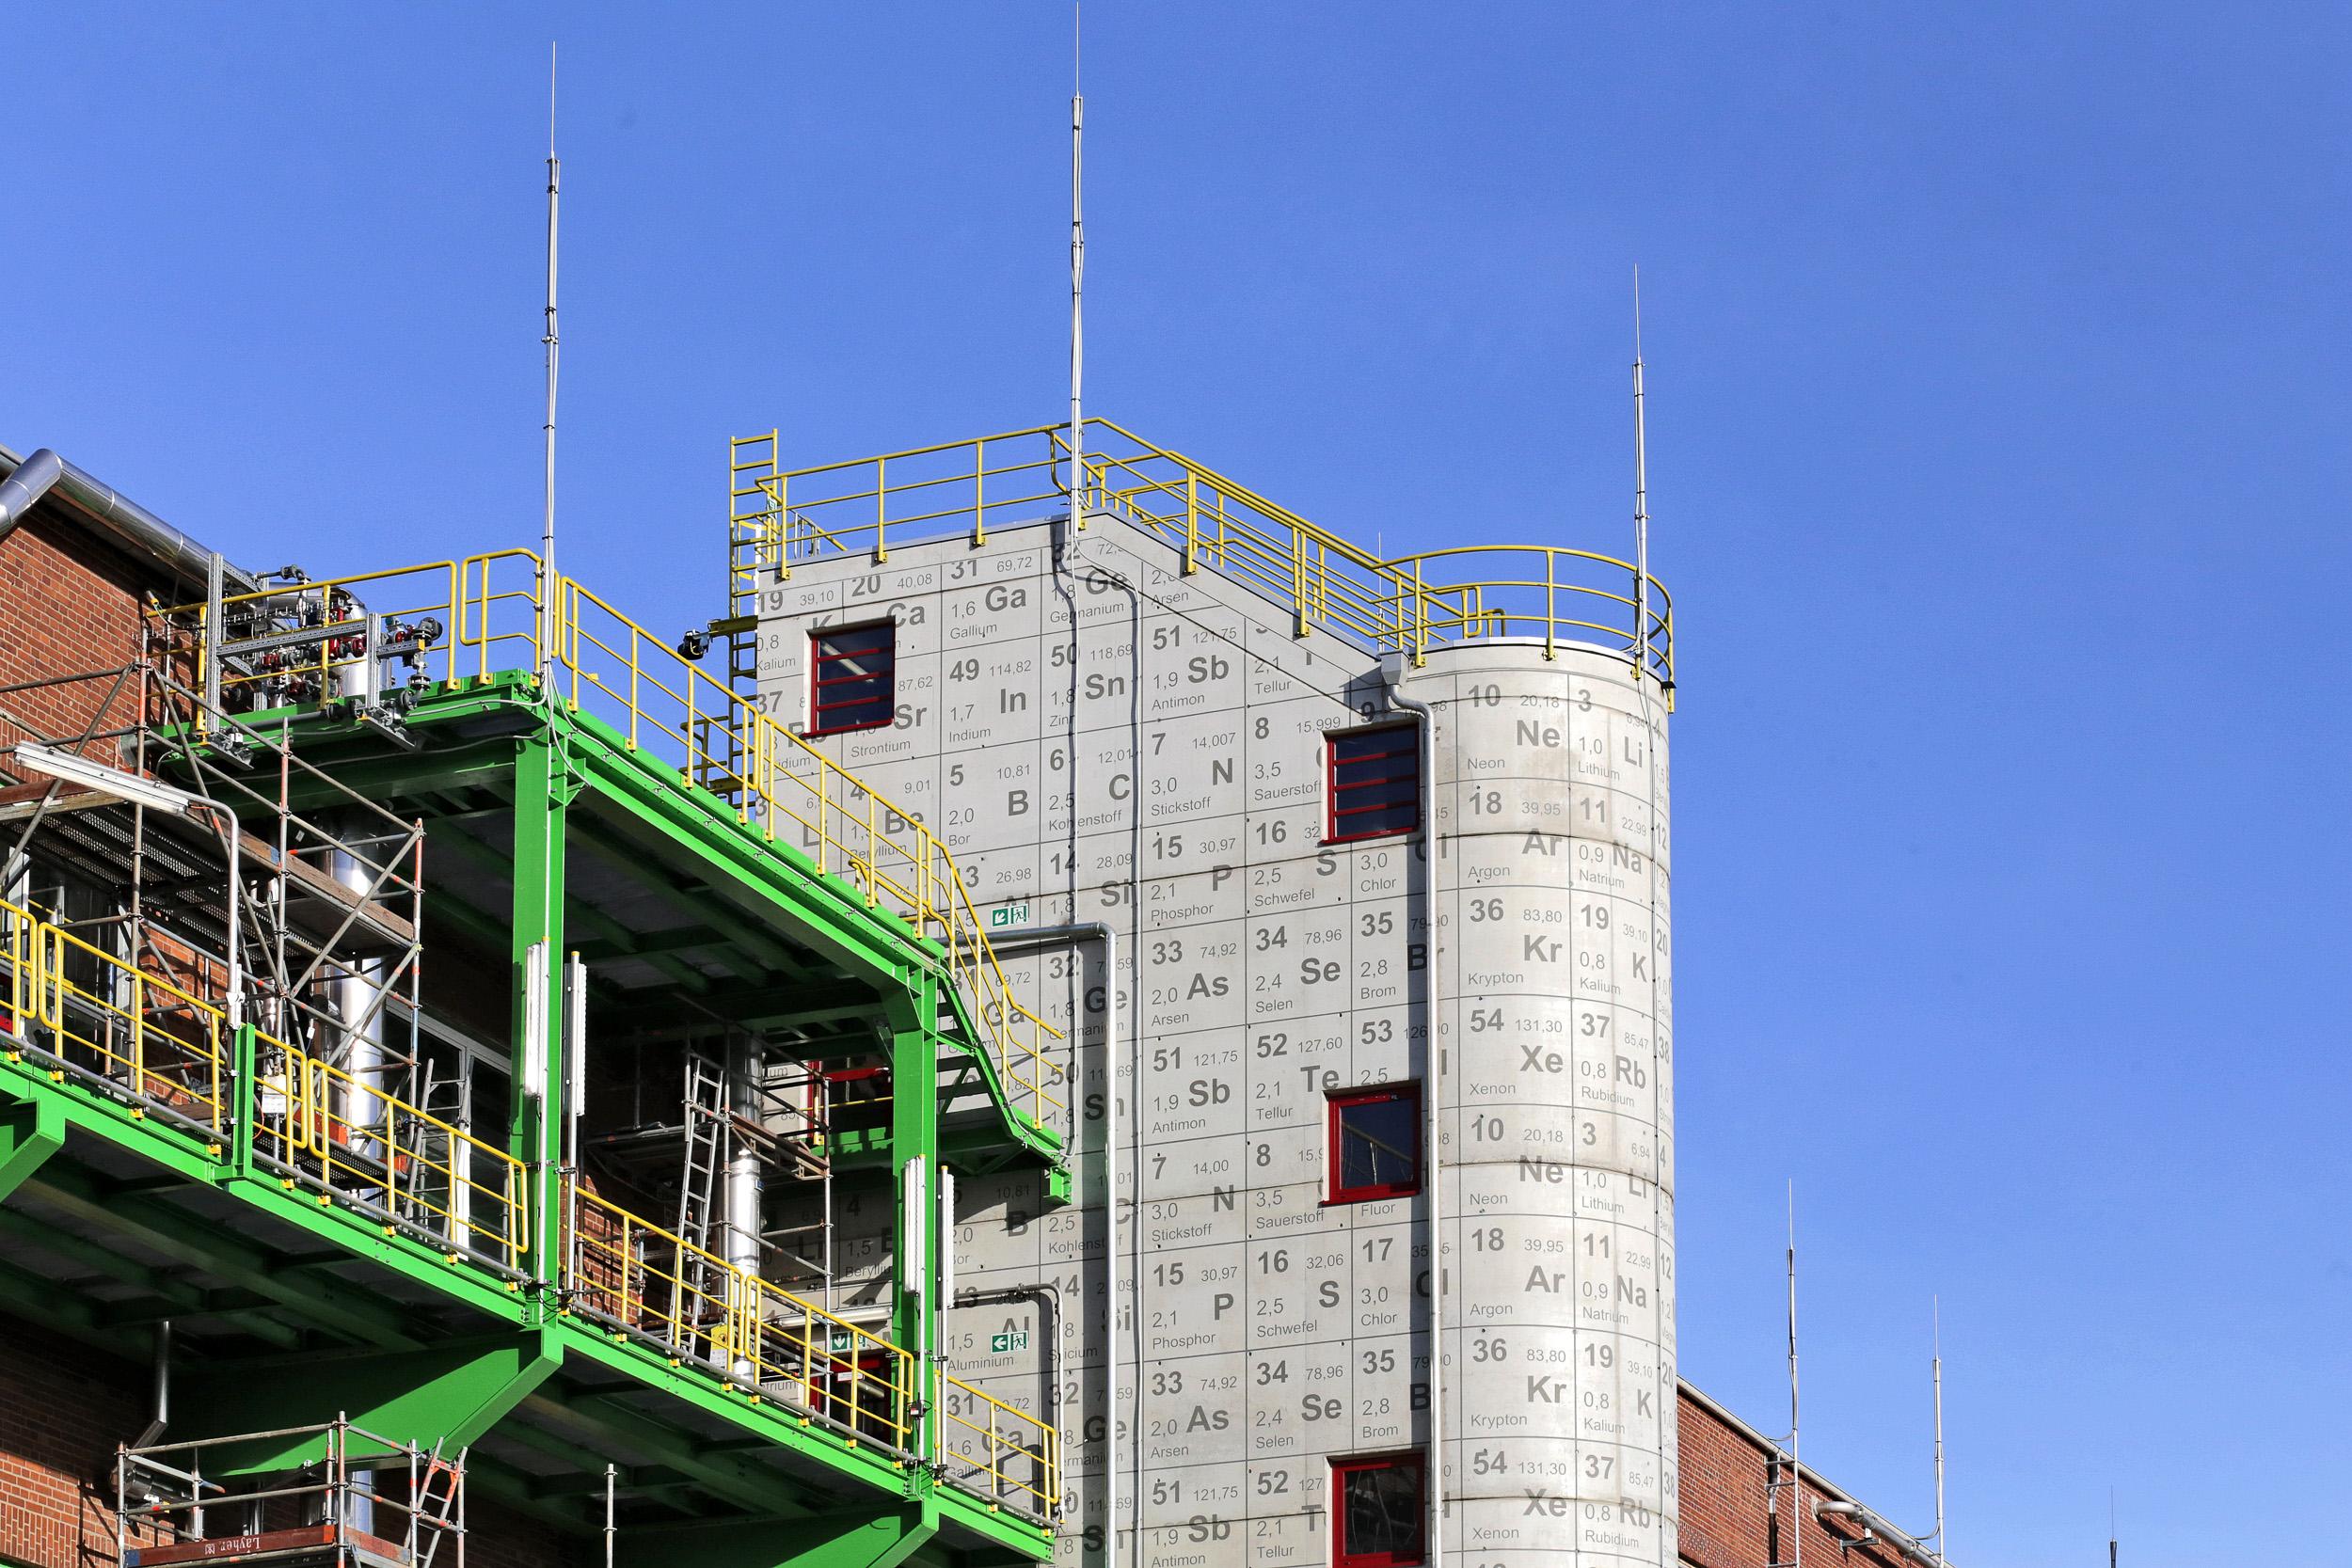 Fassadengestaltung-Industrie-Bayer-Dormagen-treppenhaus-chemie-farbkonzept-modern.jpg